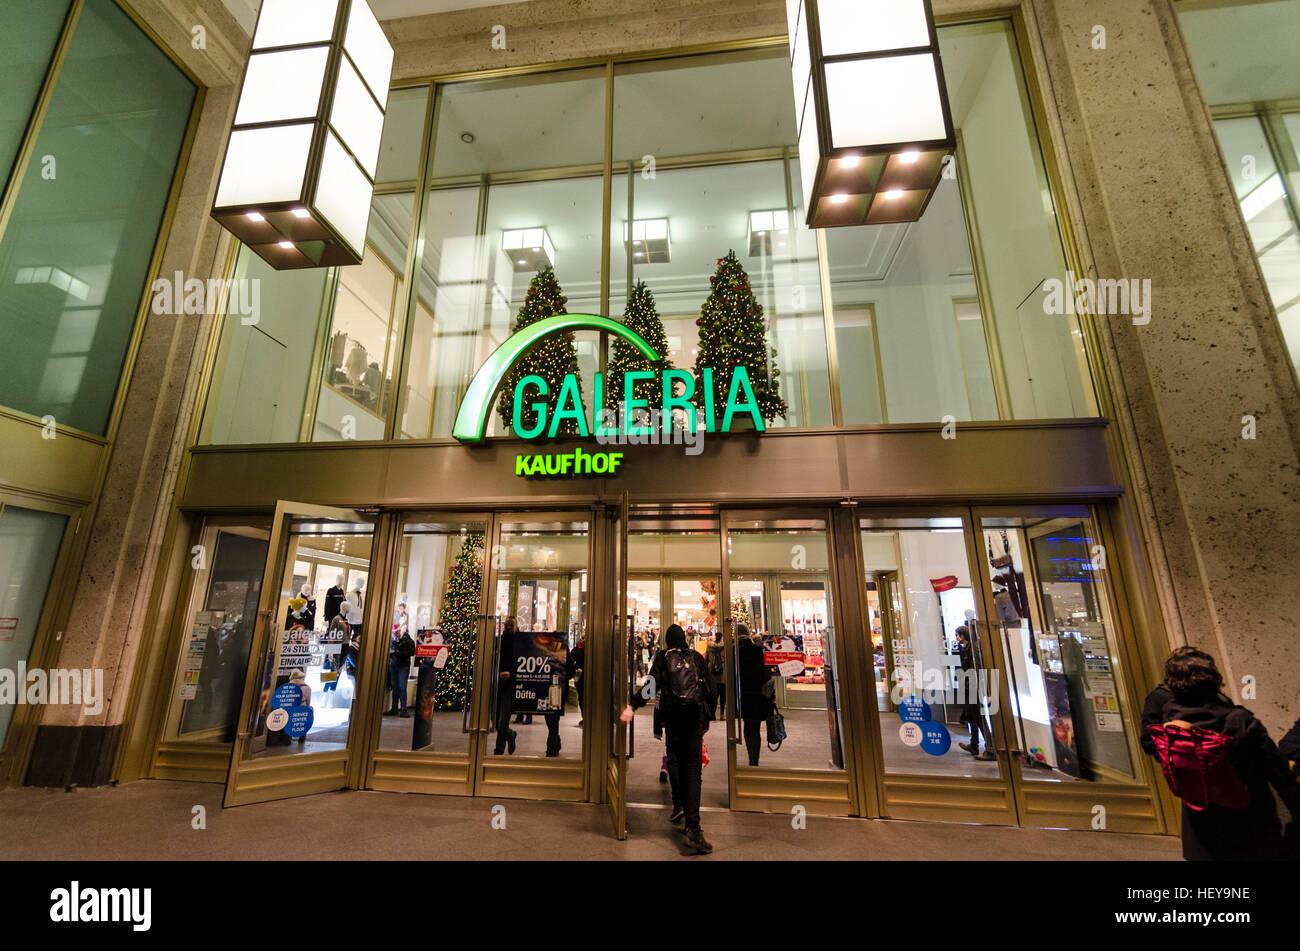 Logo and entrance outside Galeria Kaufhof; department store, shop, retailer. Alexanderplatz, Mitte, Berlin, Germany. - Stock Image